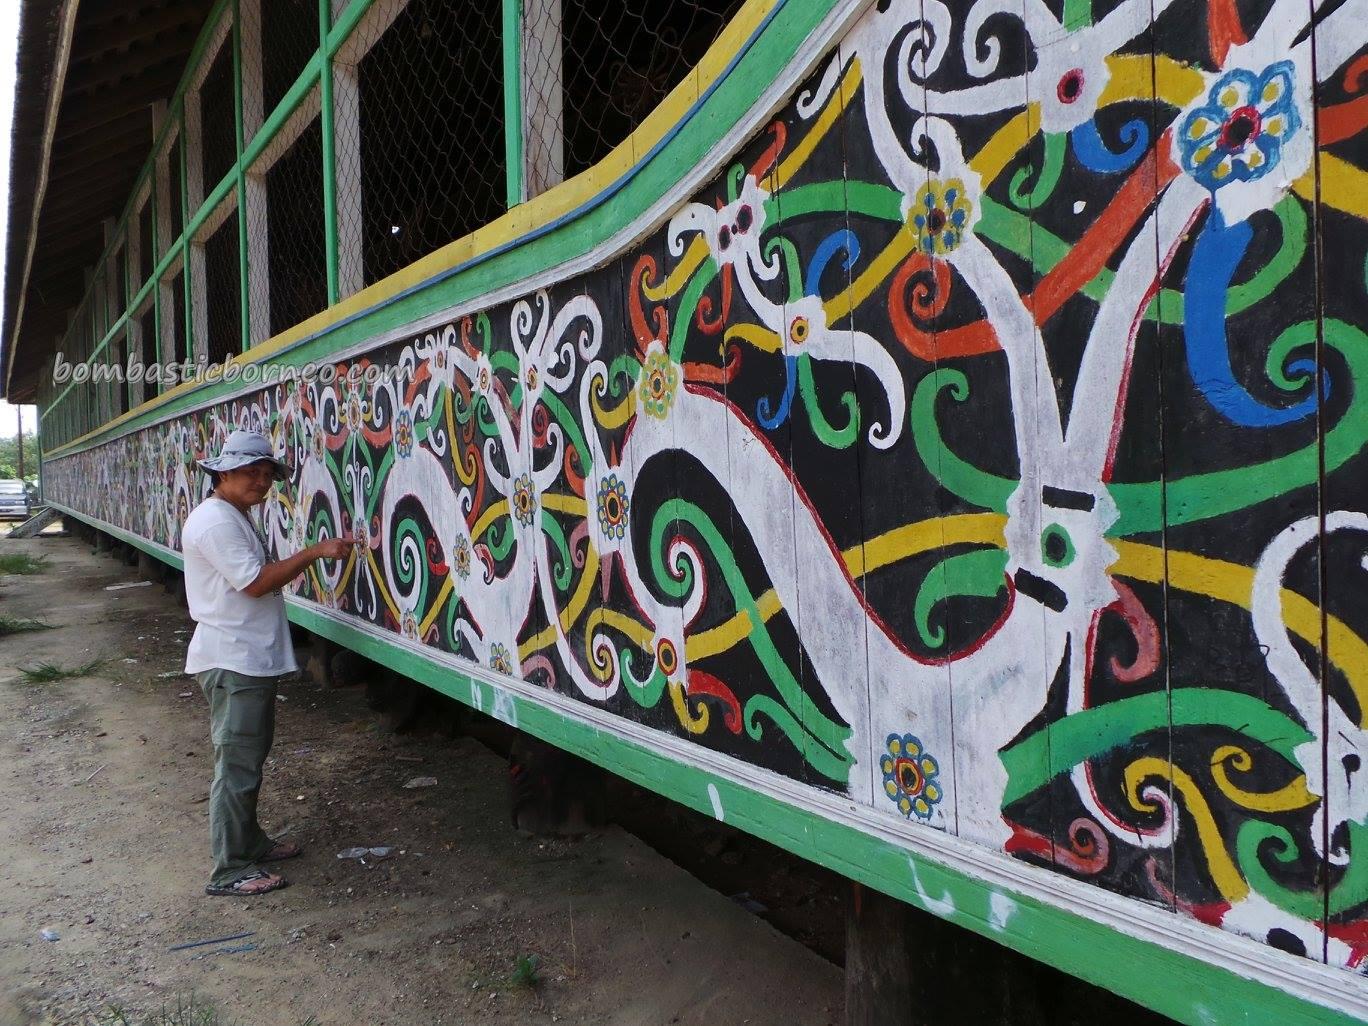 adventure, authentic village, culture, customs hall, Ethnic, indigenous, Borneo, Kongbeng, Kalimantan Timur, Lamin Adat Lakeq Bilung Jau, longhouse, Miau Baru, Suku Dayak Kayan, Tourism, travel, traditional, tribal, tribe,